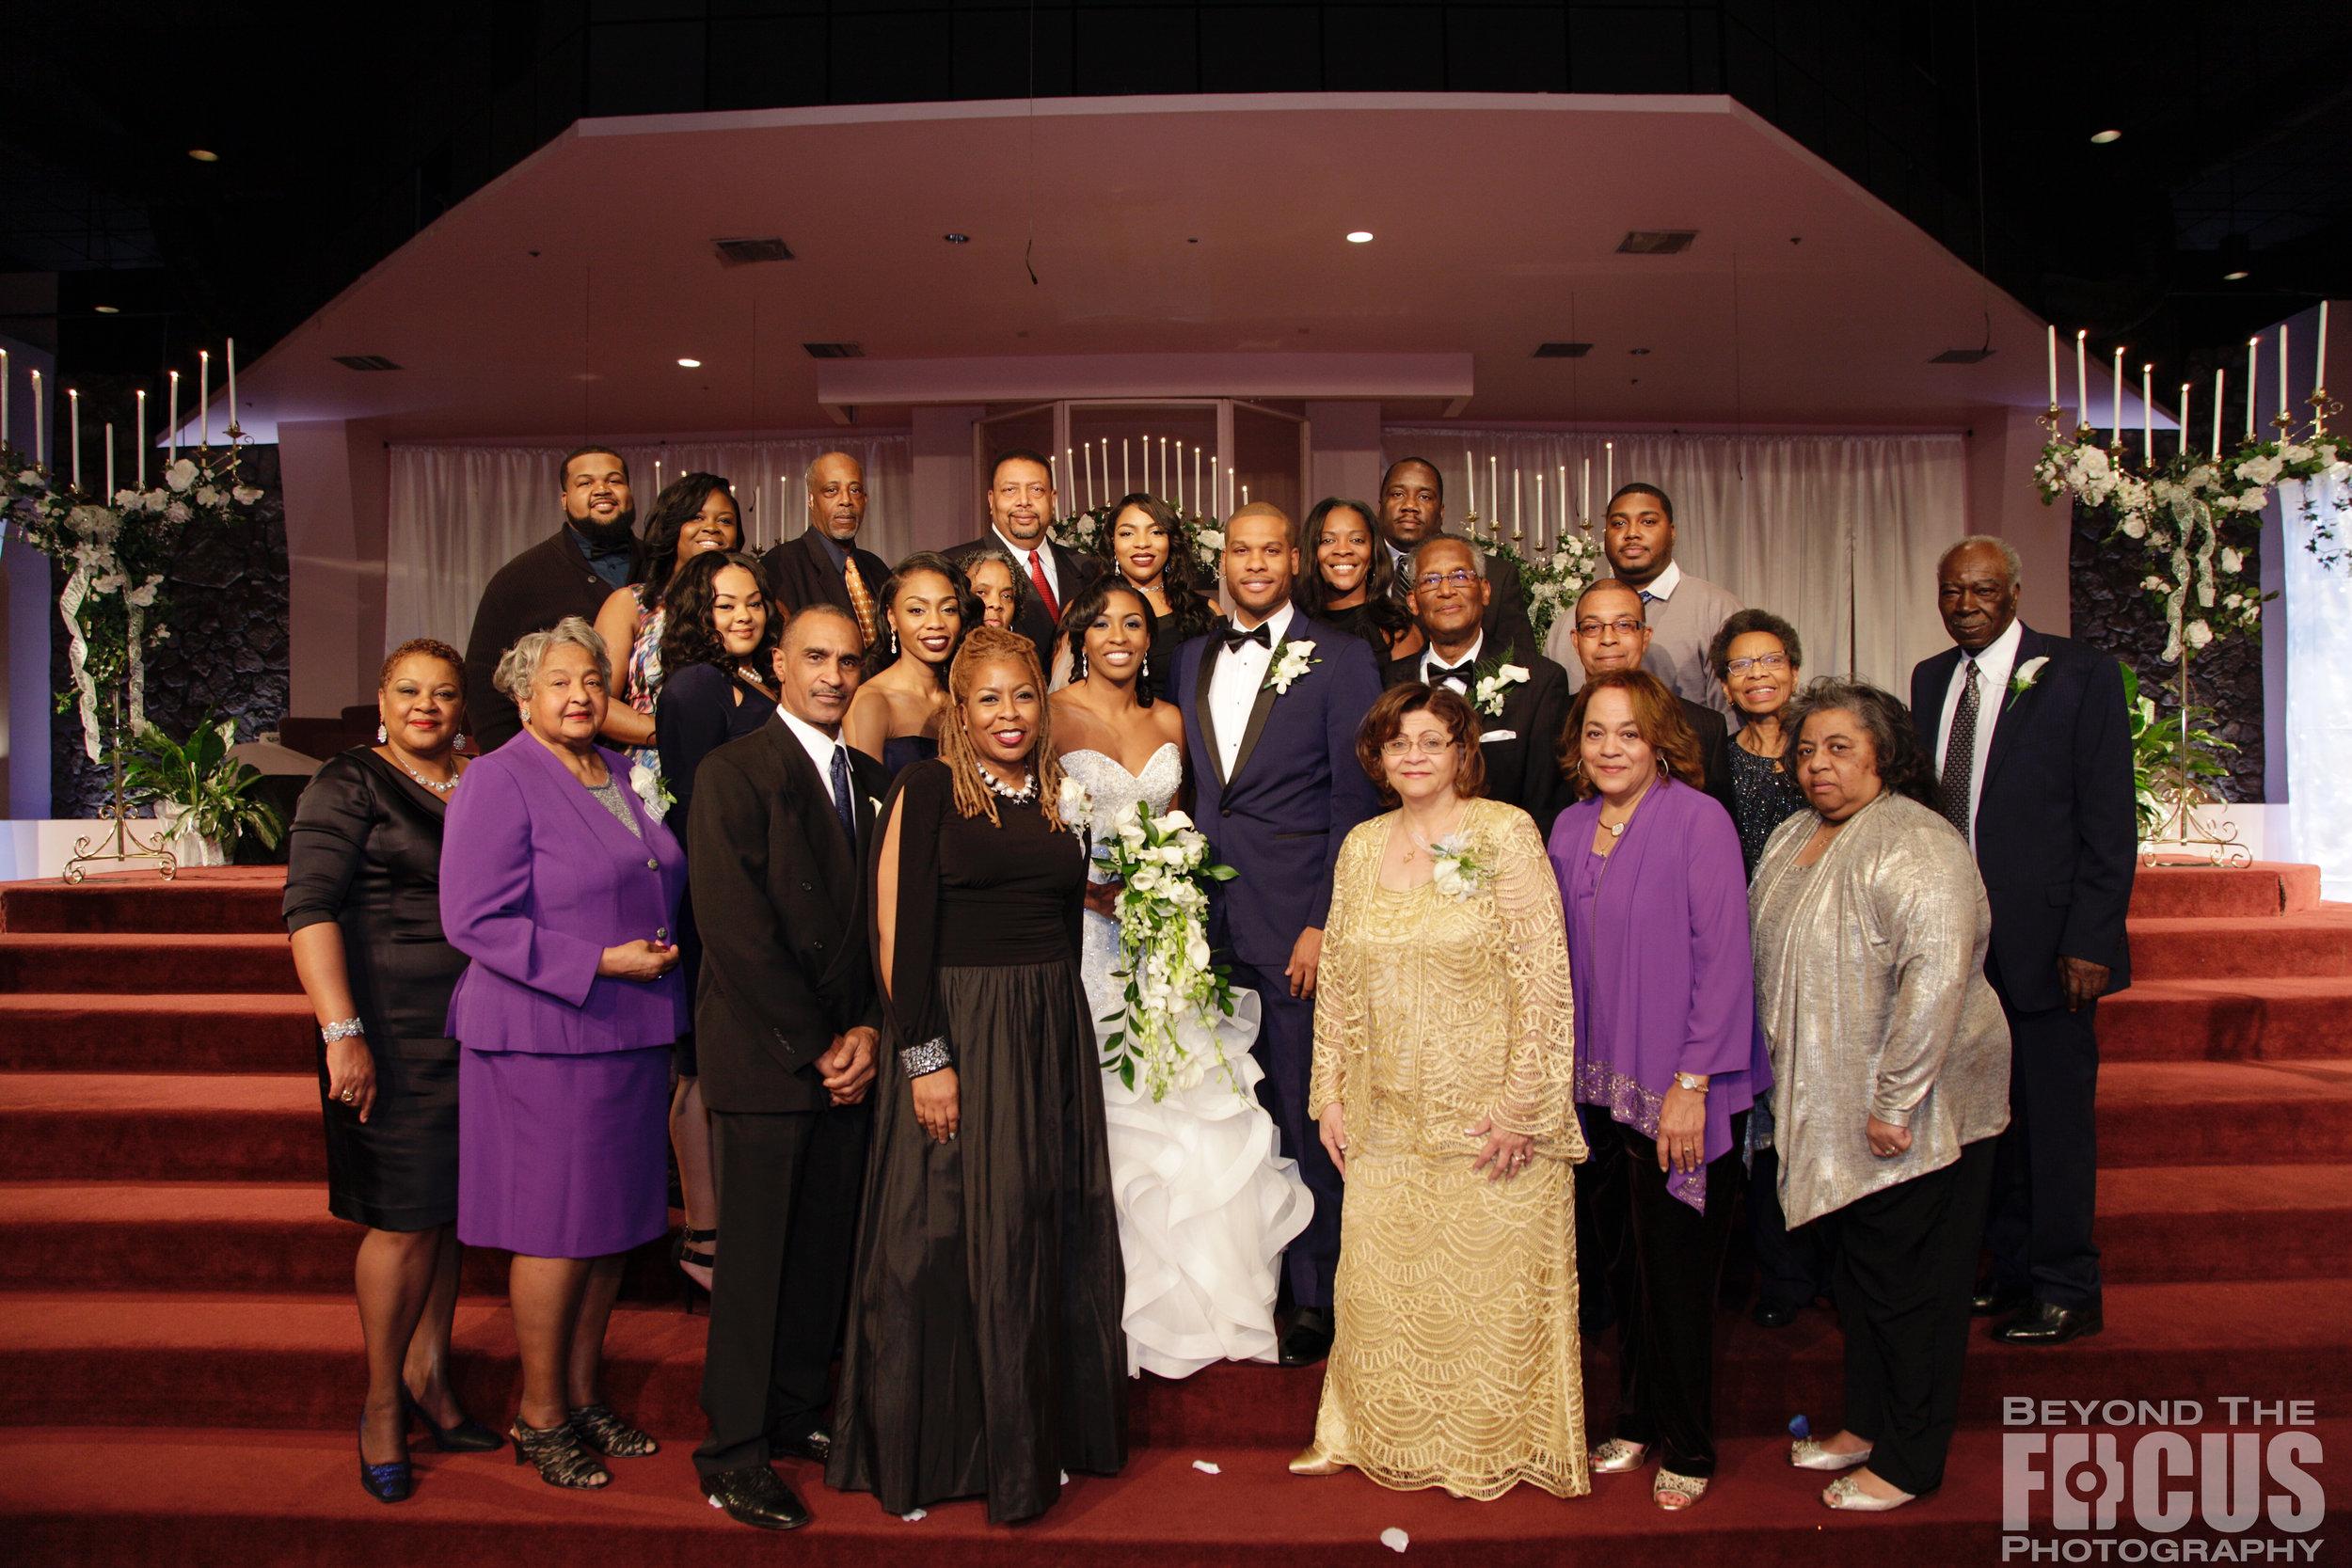 Matthews_Wedding_Ceremony_131.jpg